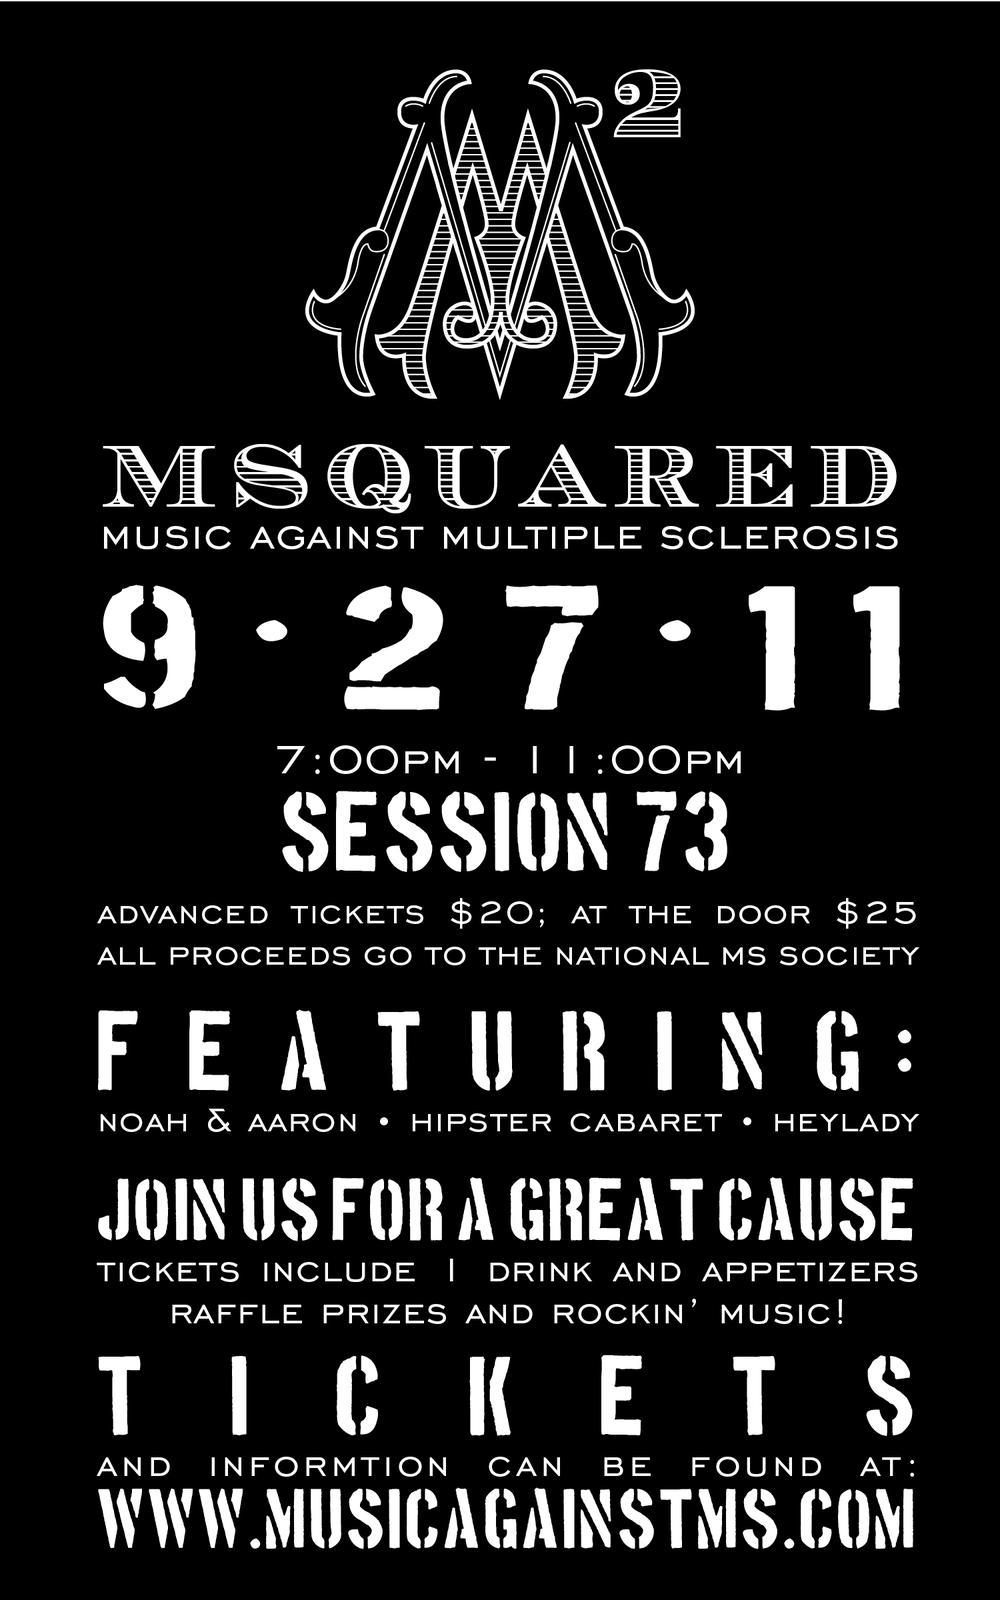 MSquaredFlyer-2011.jpg